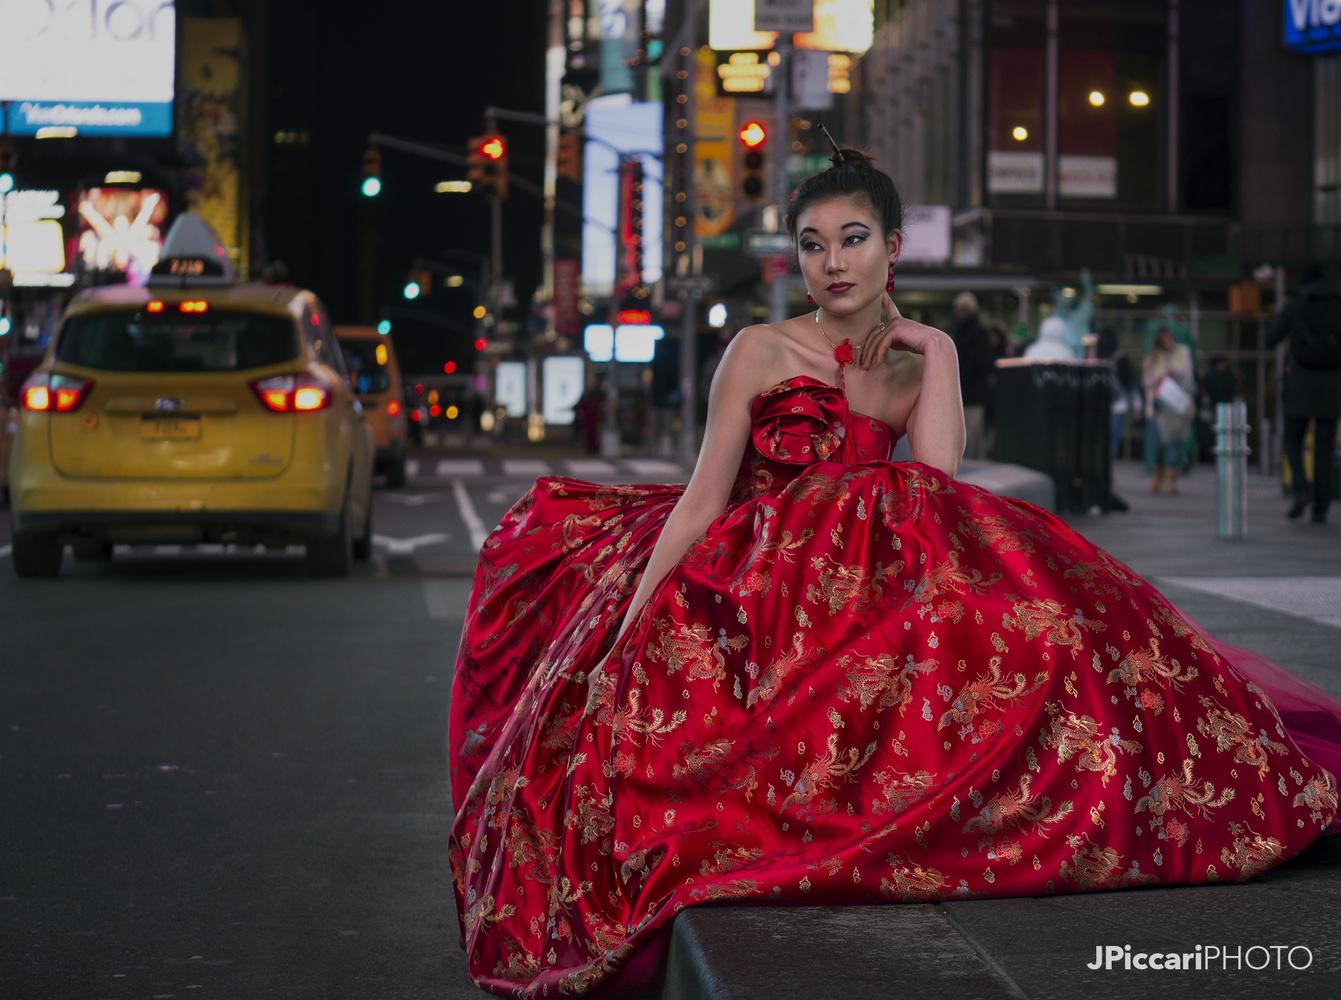 NYC Fashion by Justin Piccari